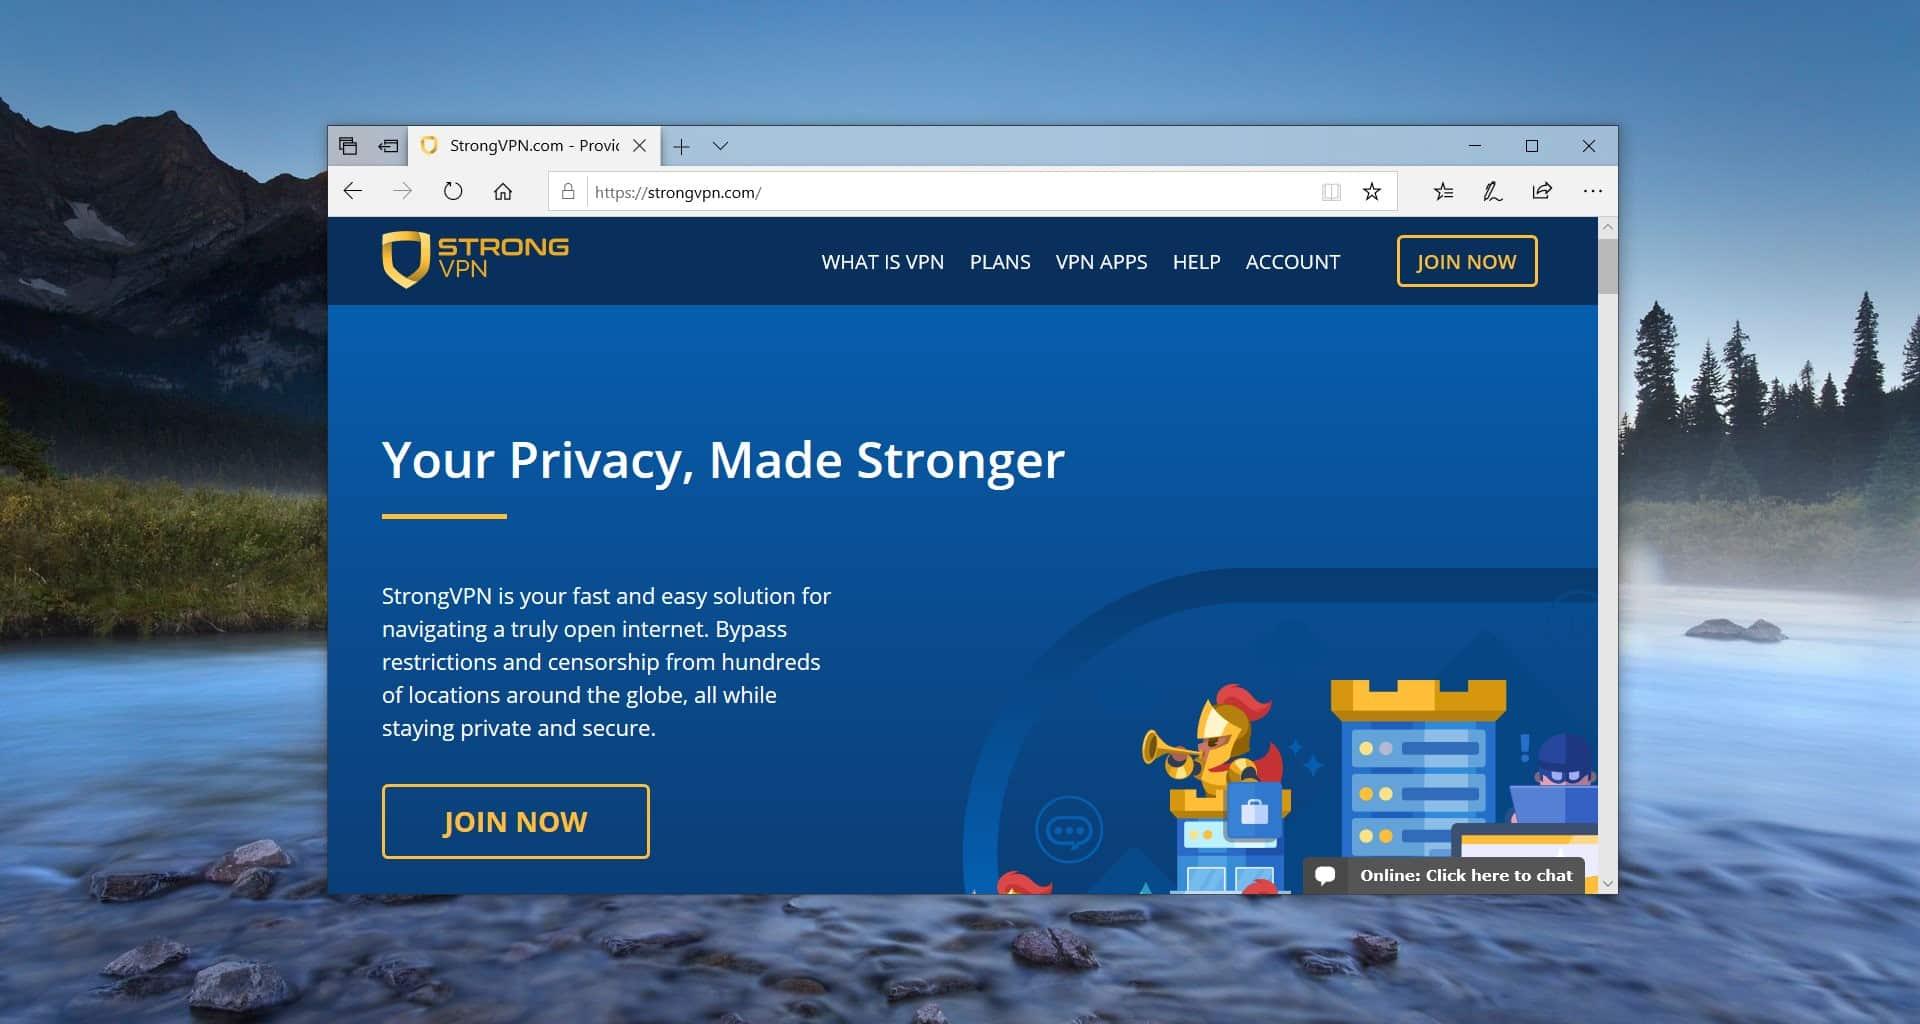 StrongVPN- Paid VPN service